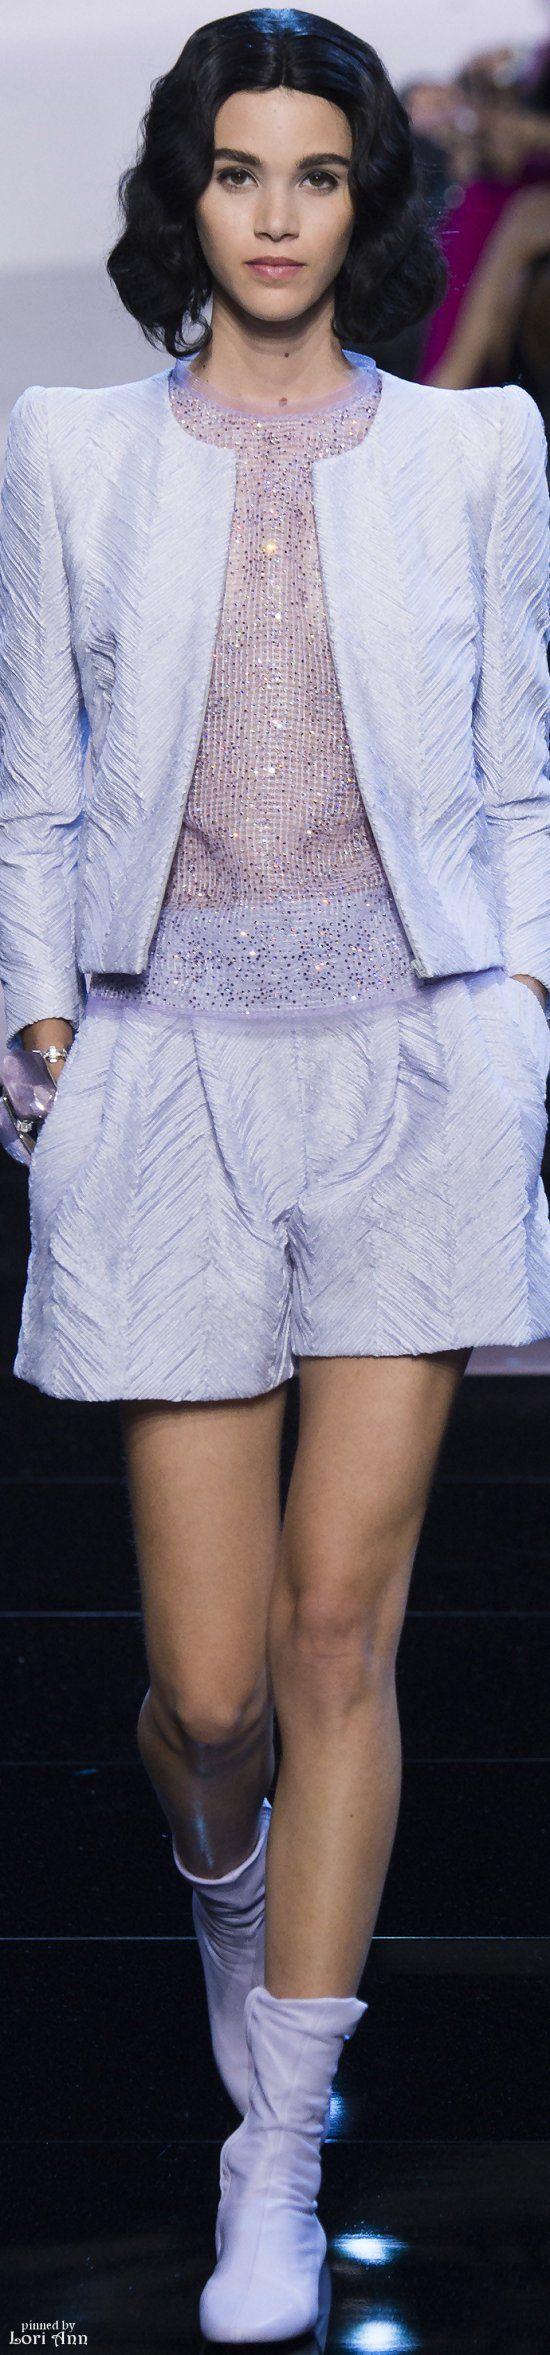 Armani Privé Couture Spring 2016